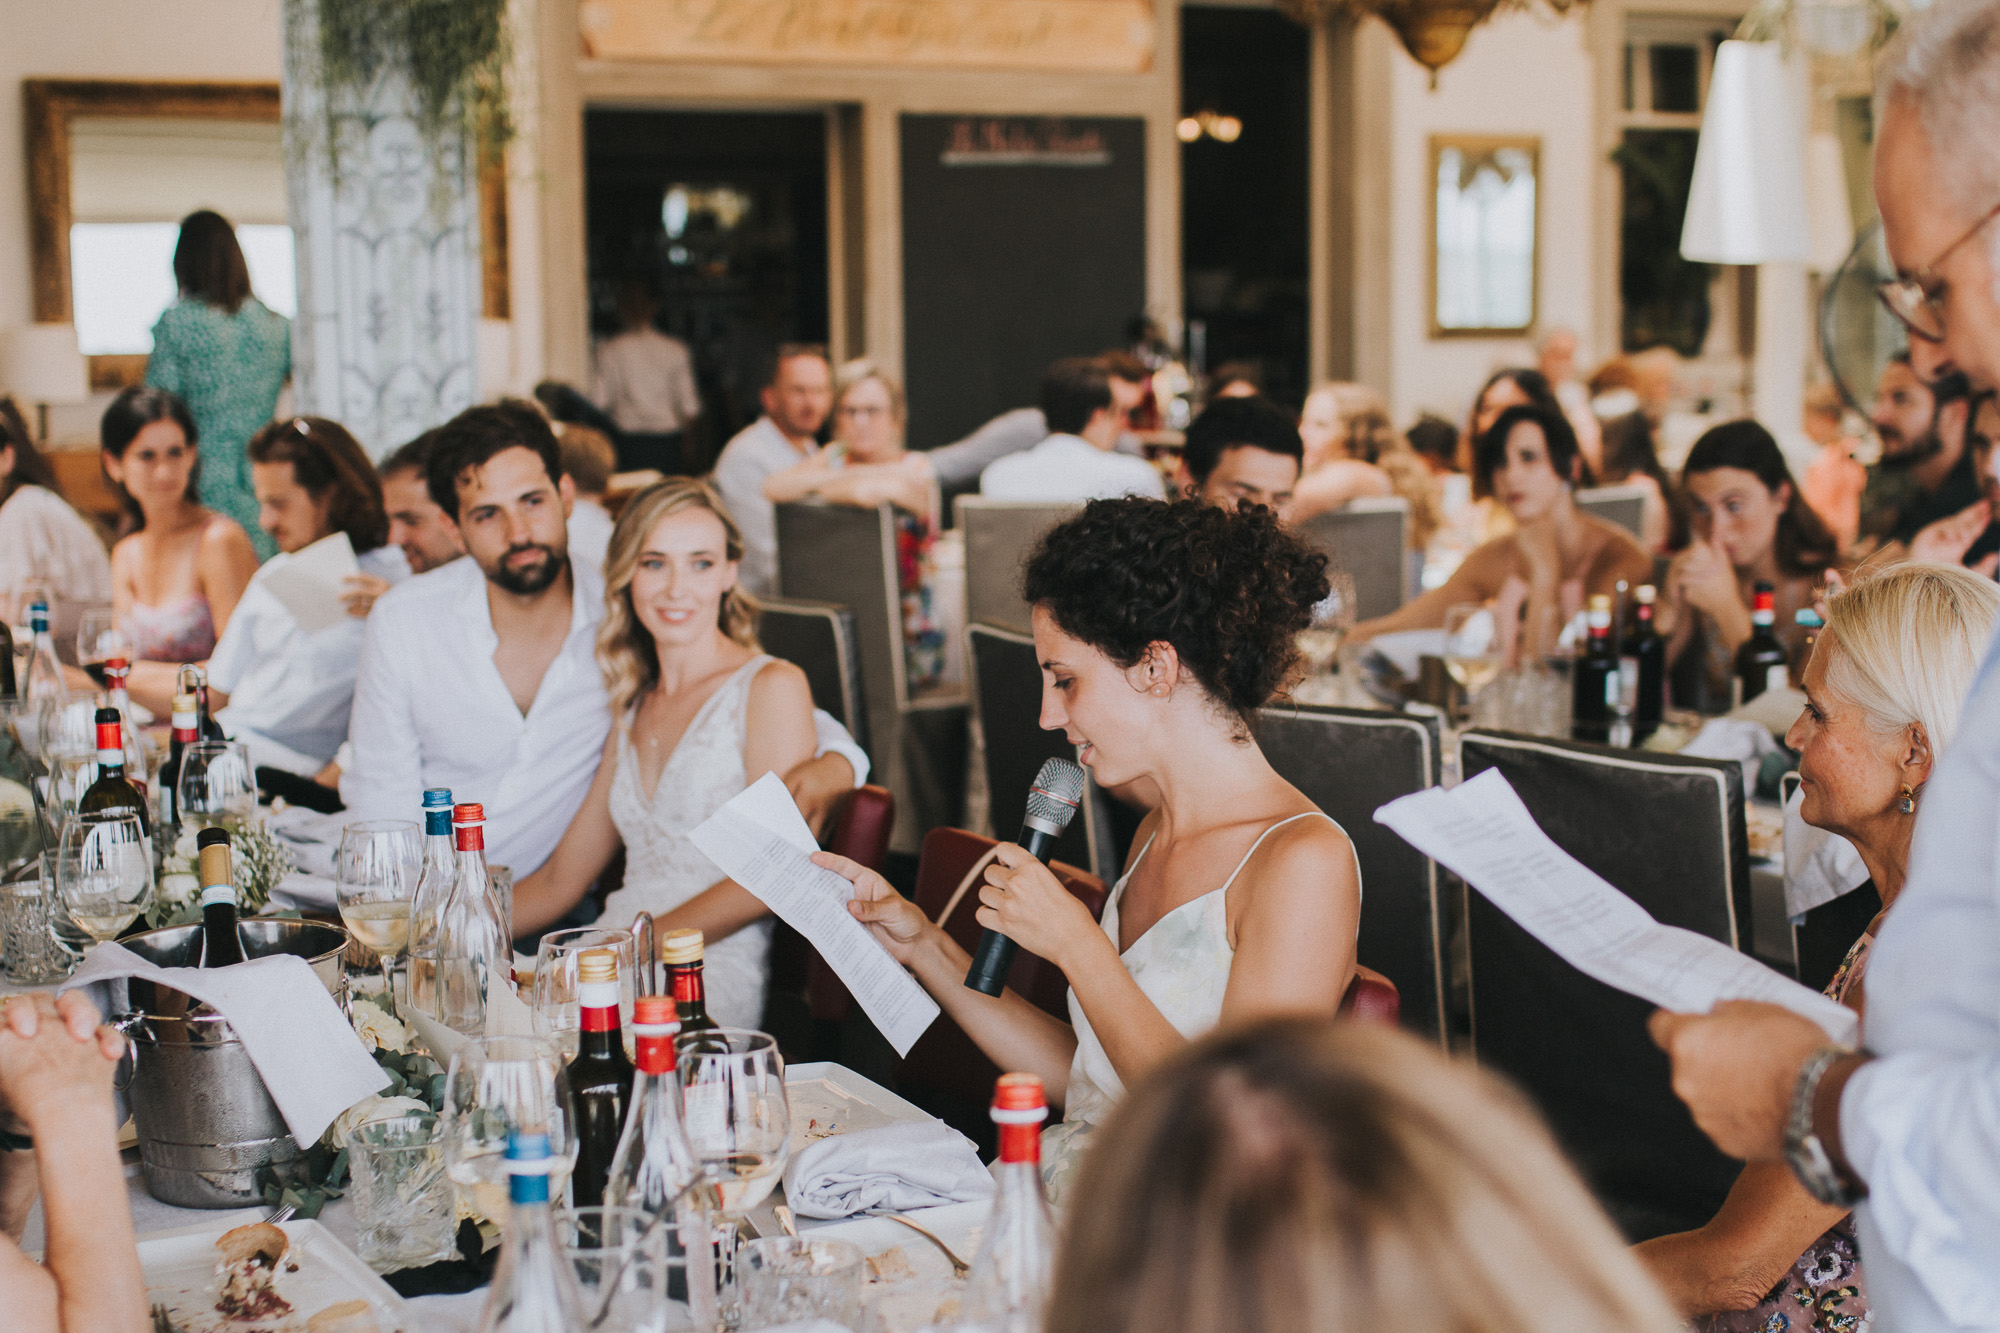 20180720-Memoryfactory-Sara&Jacopo-77- Hochzeit.jpg